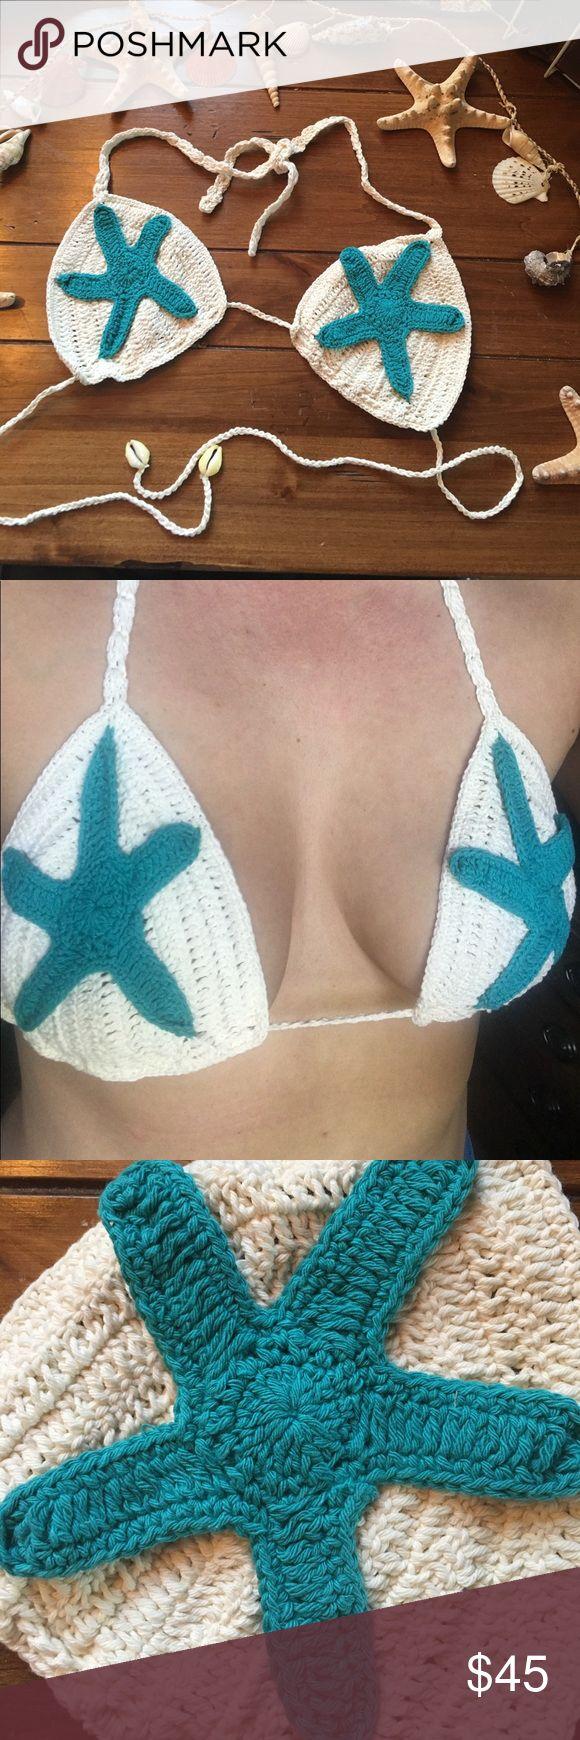 Starfish Bikini Top Mermaid accessories. This top is a handmade crochet bikini top. Cream bikini with teal sea star accents. ❤️🐚✨ Melayni.com Swim Bikinis